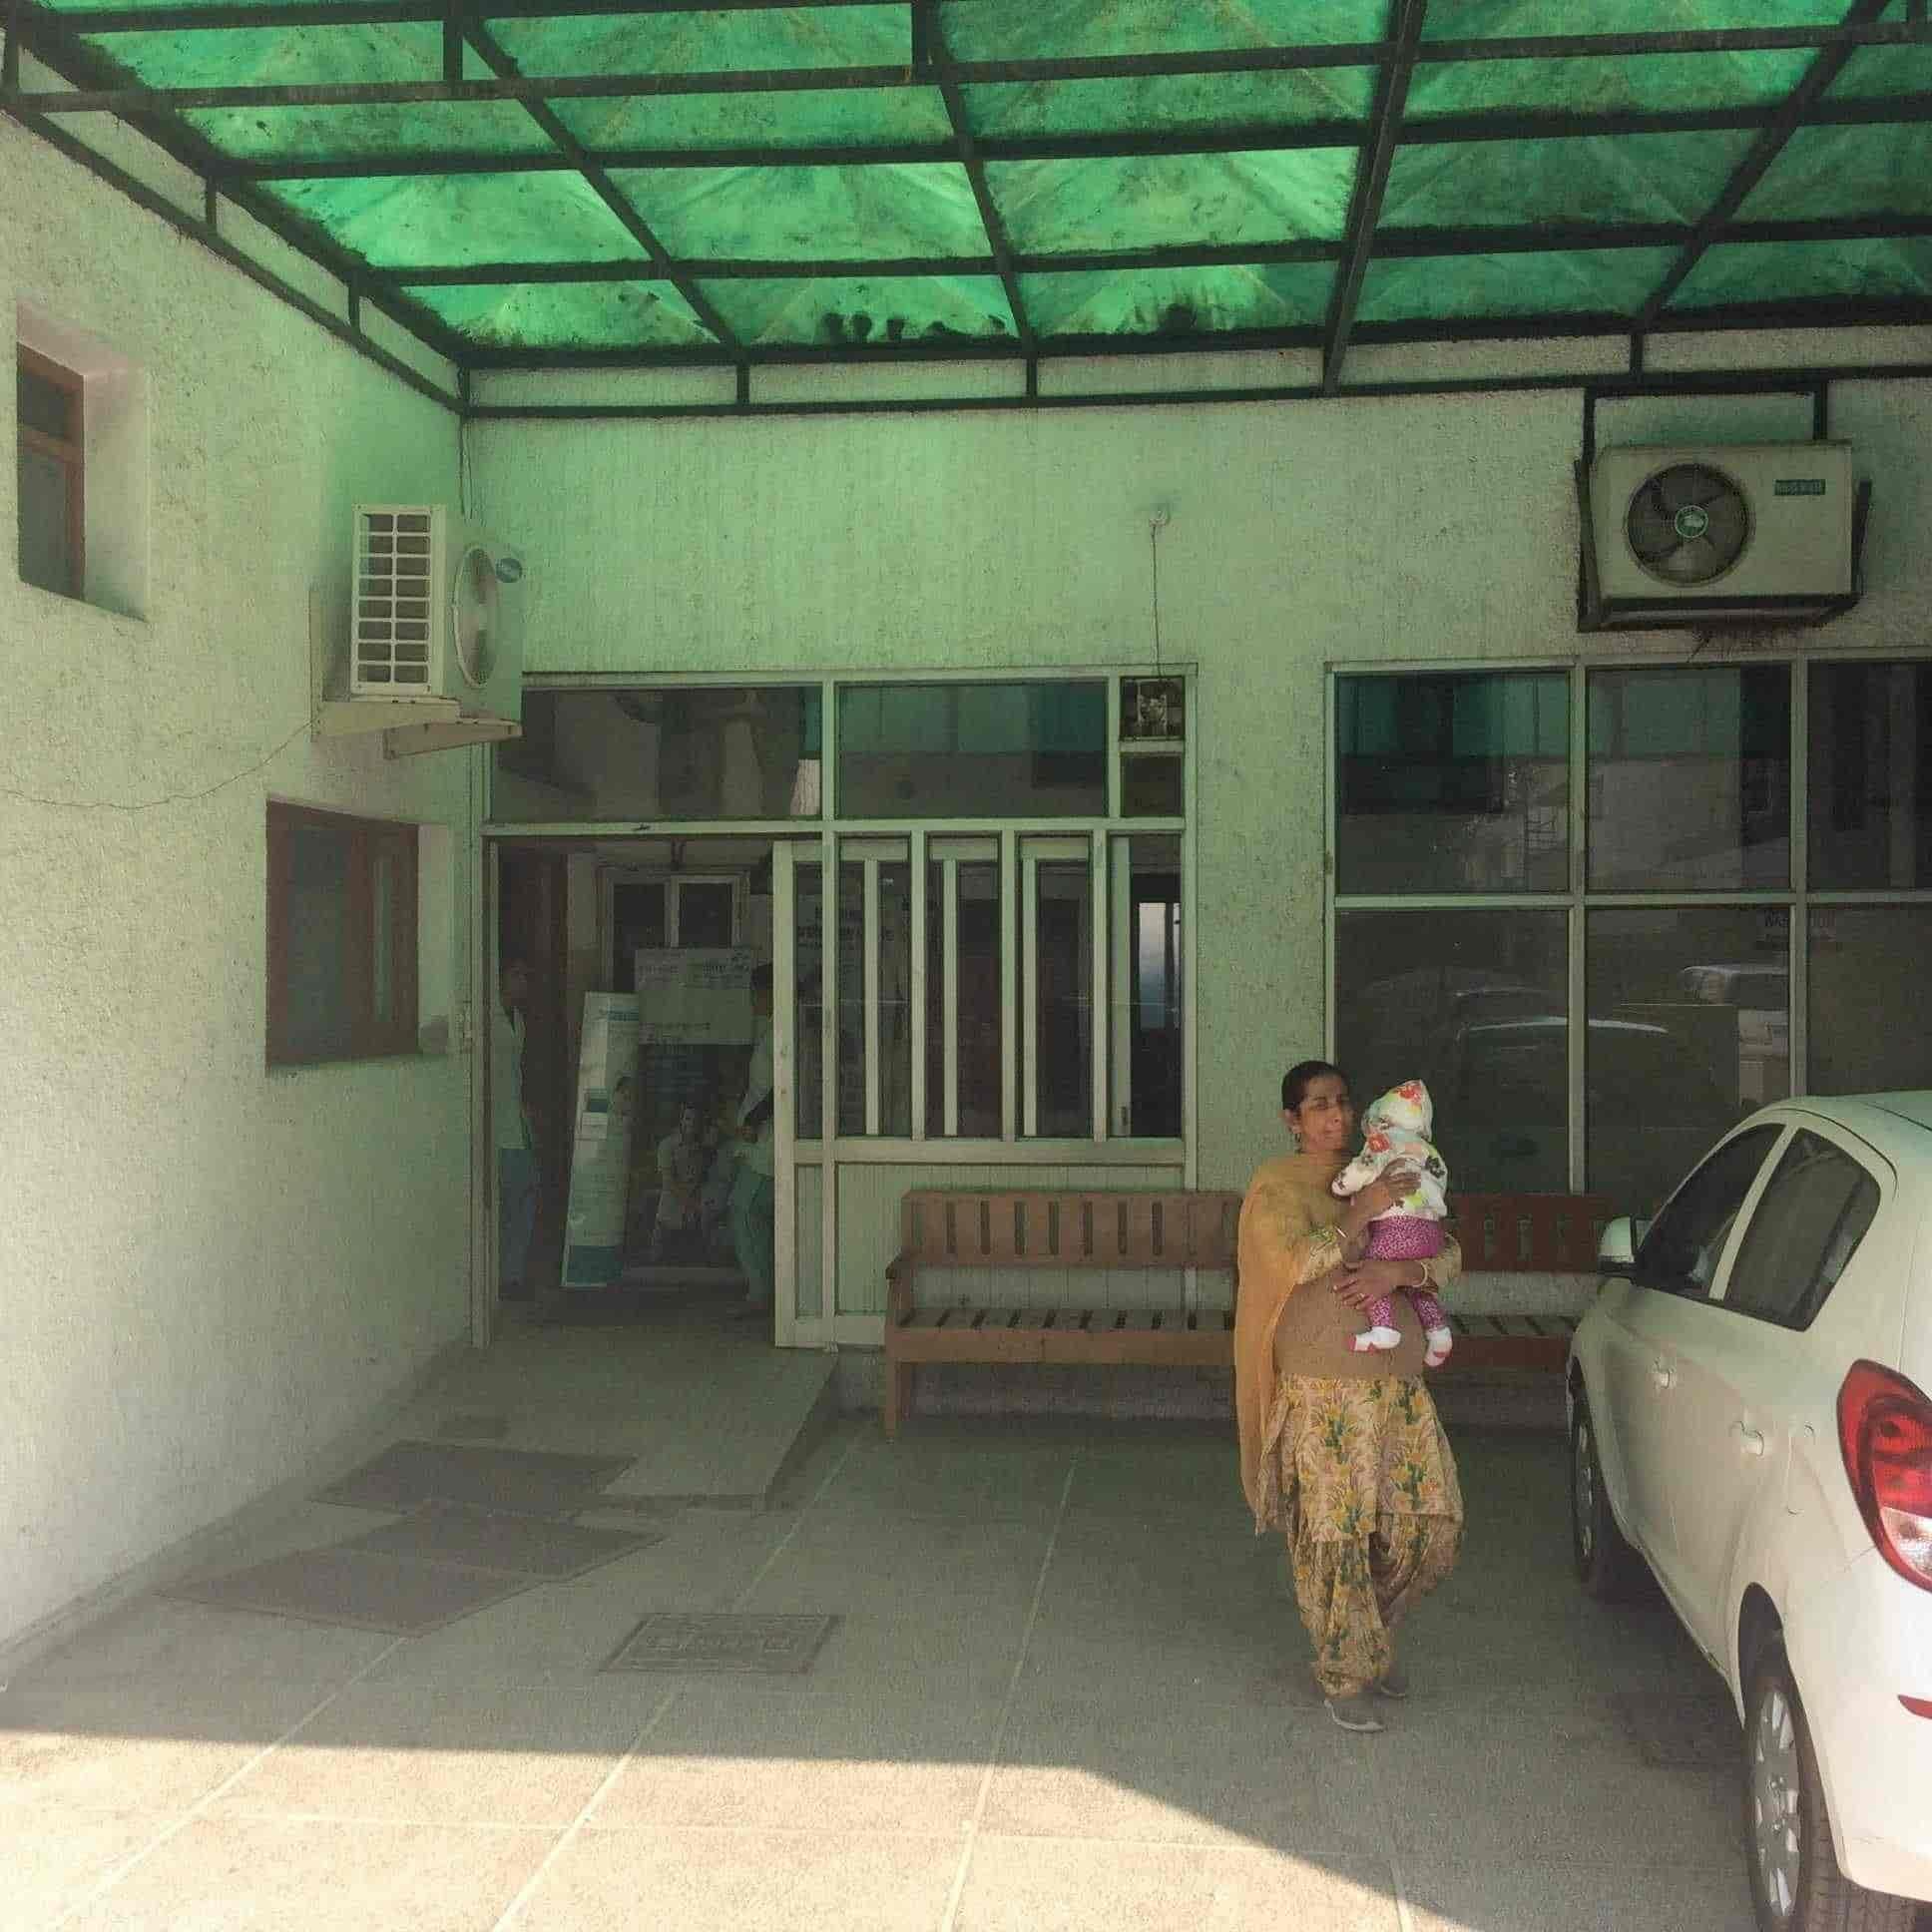 Liberty Hospital Photos, Sas Nagar, Mohali- Pictures